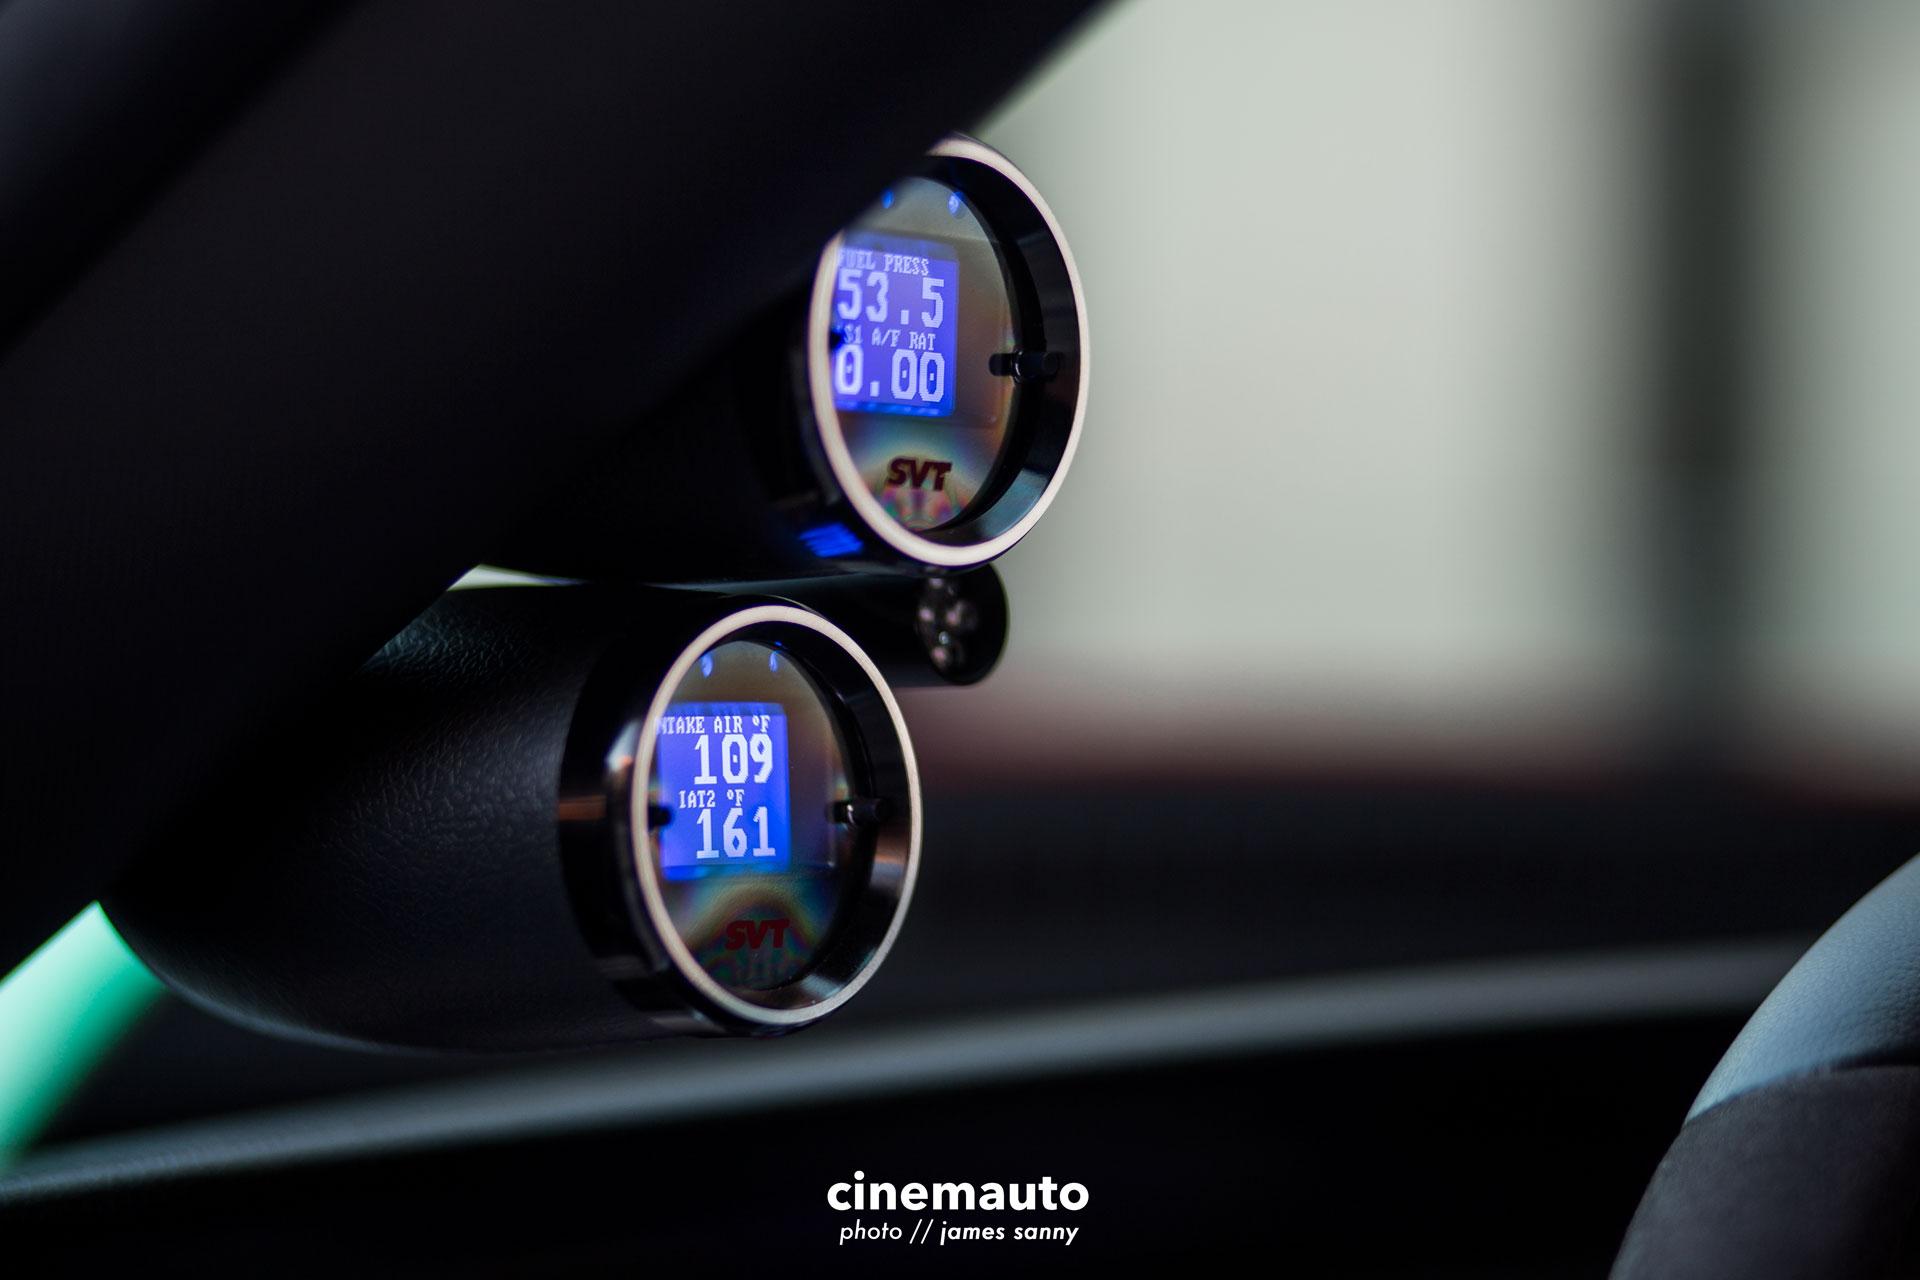 cinemauto-wichita-automotive-photography-cj8a.jpg